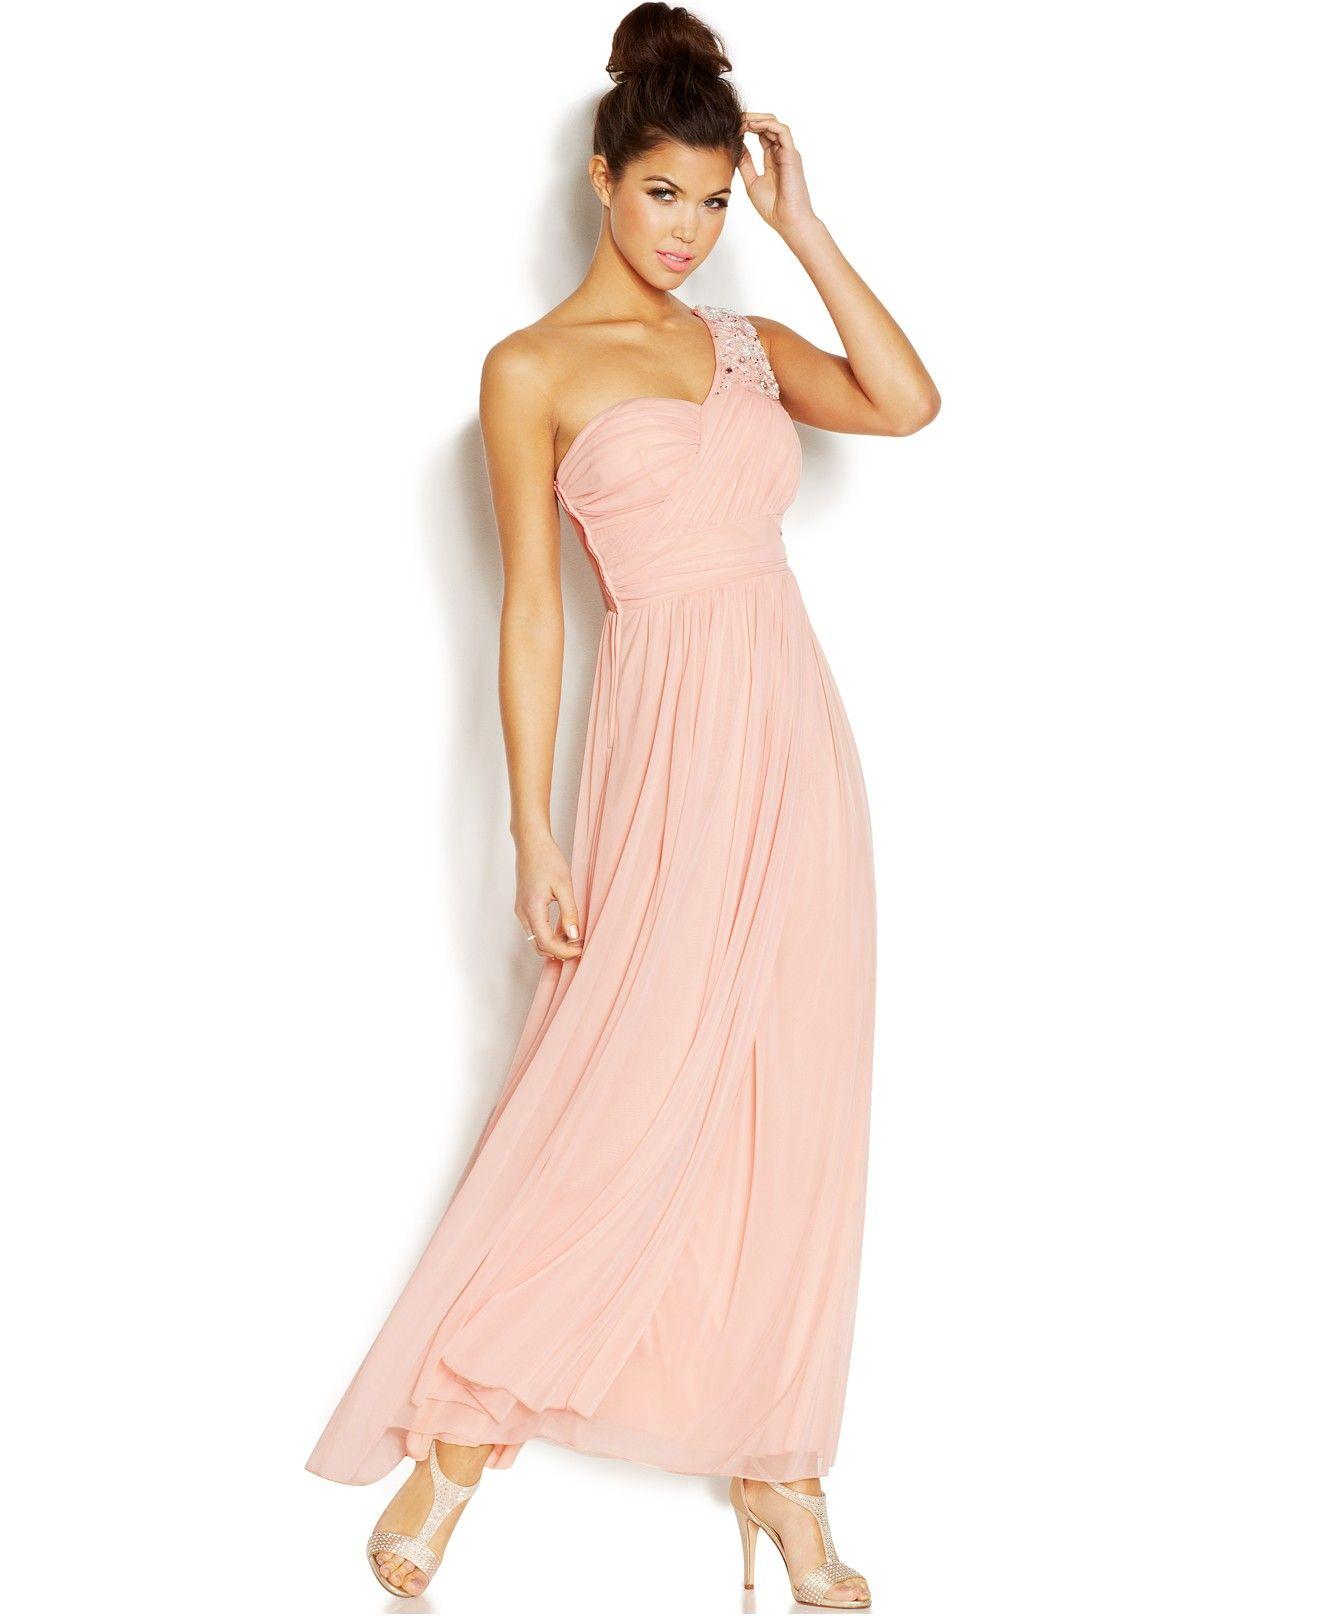 B Darlin Juniors' One-Shoulder Gown - Juniors Shop All Prom ...